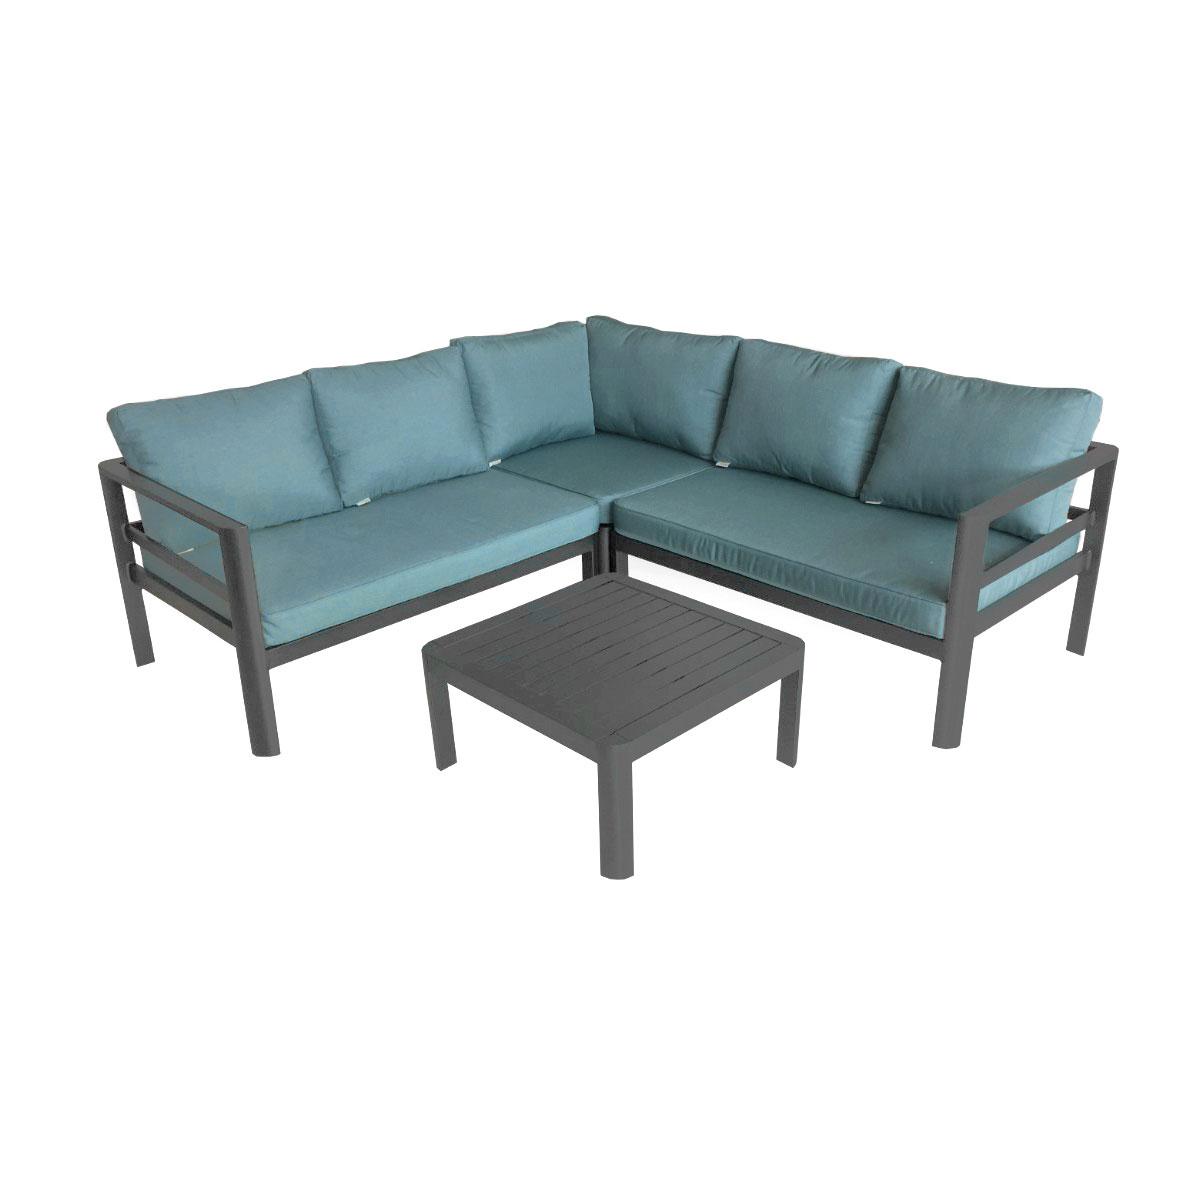 Loungemöbel - Lounge Set Lago, petrol, inkl. Kissen  - Onlineshop Hellweg